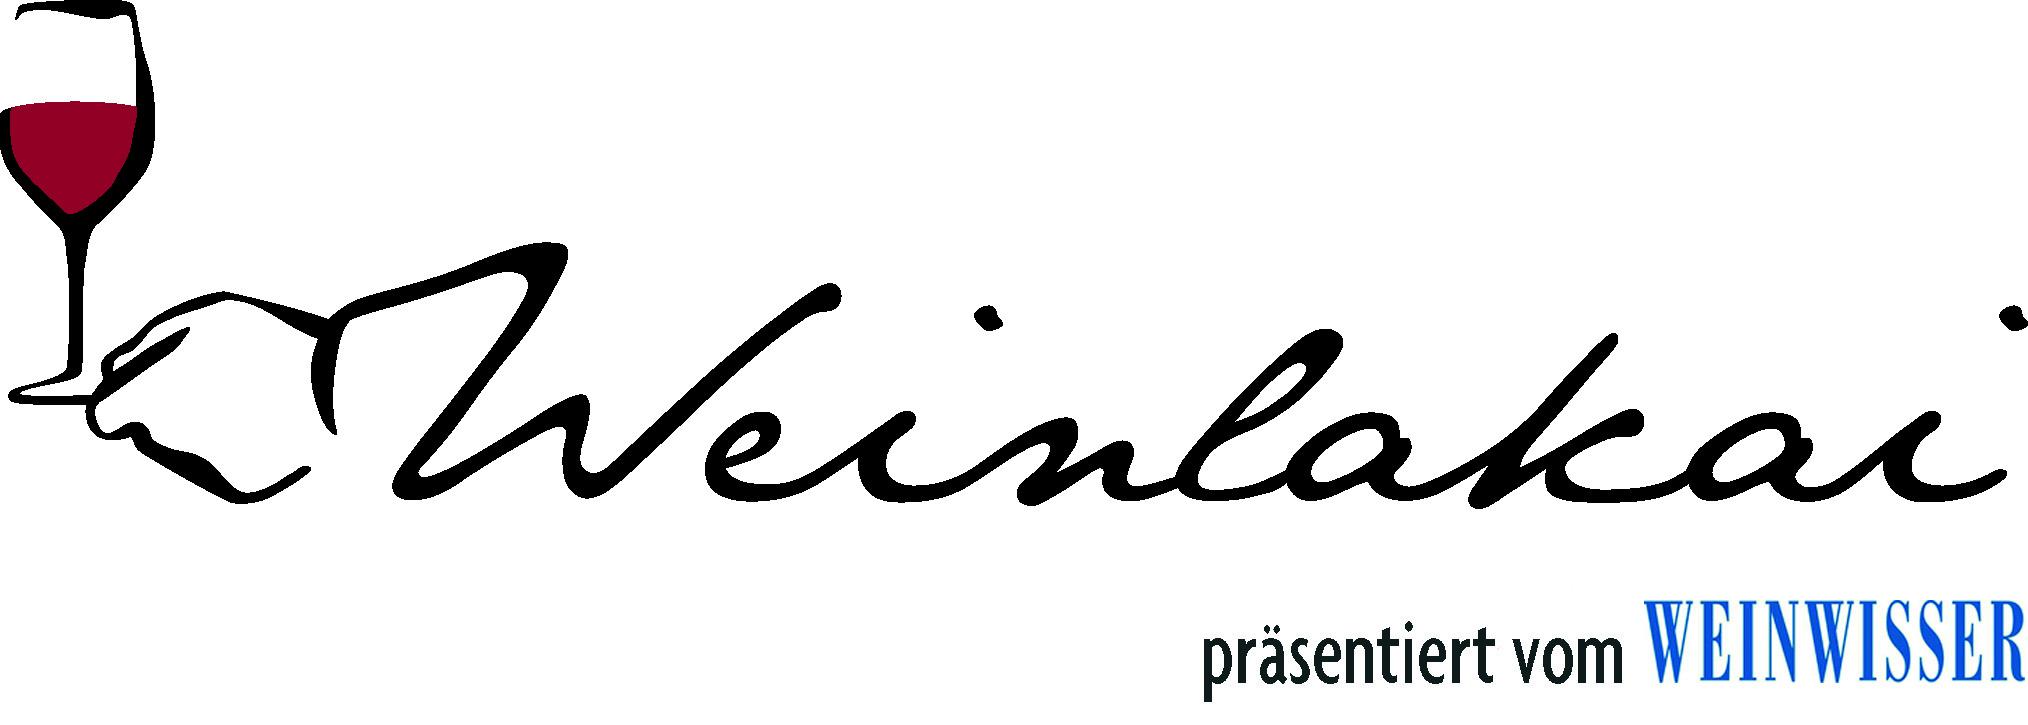 Weinlakai